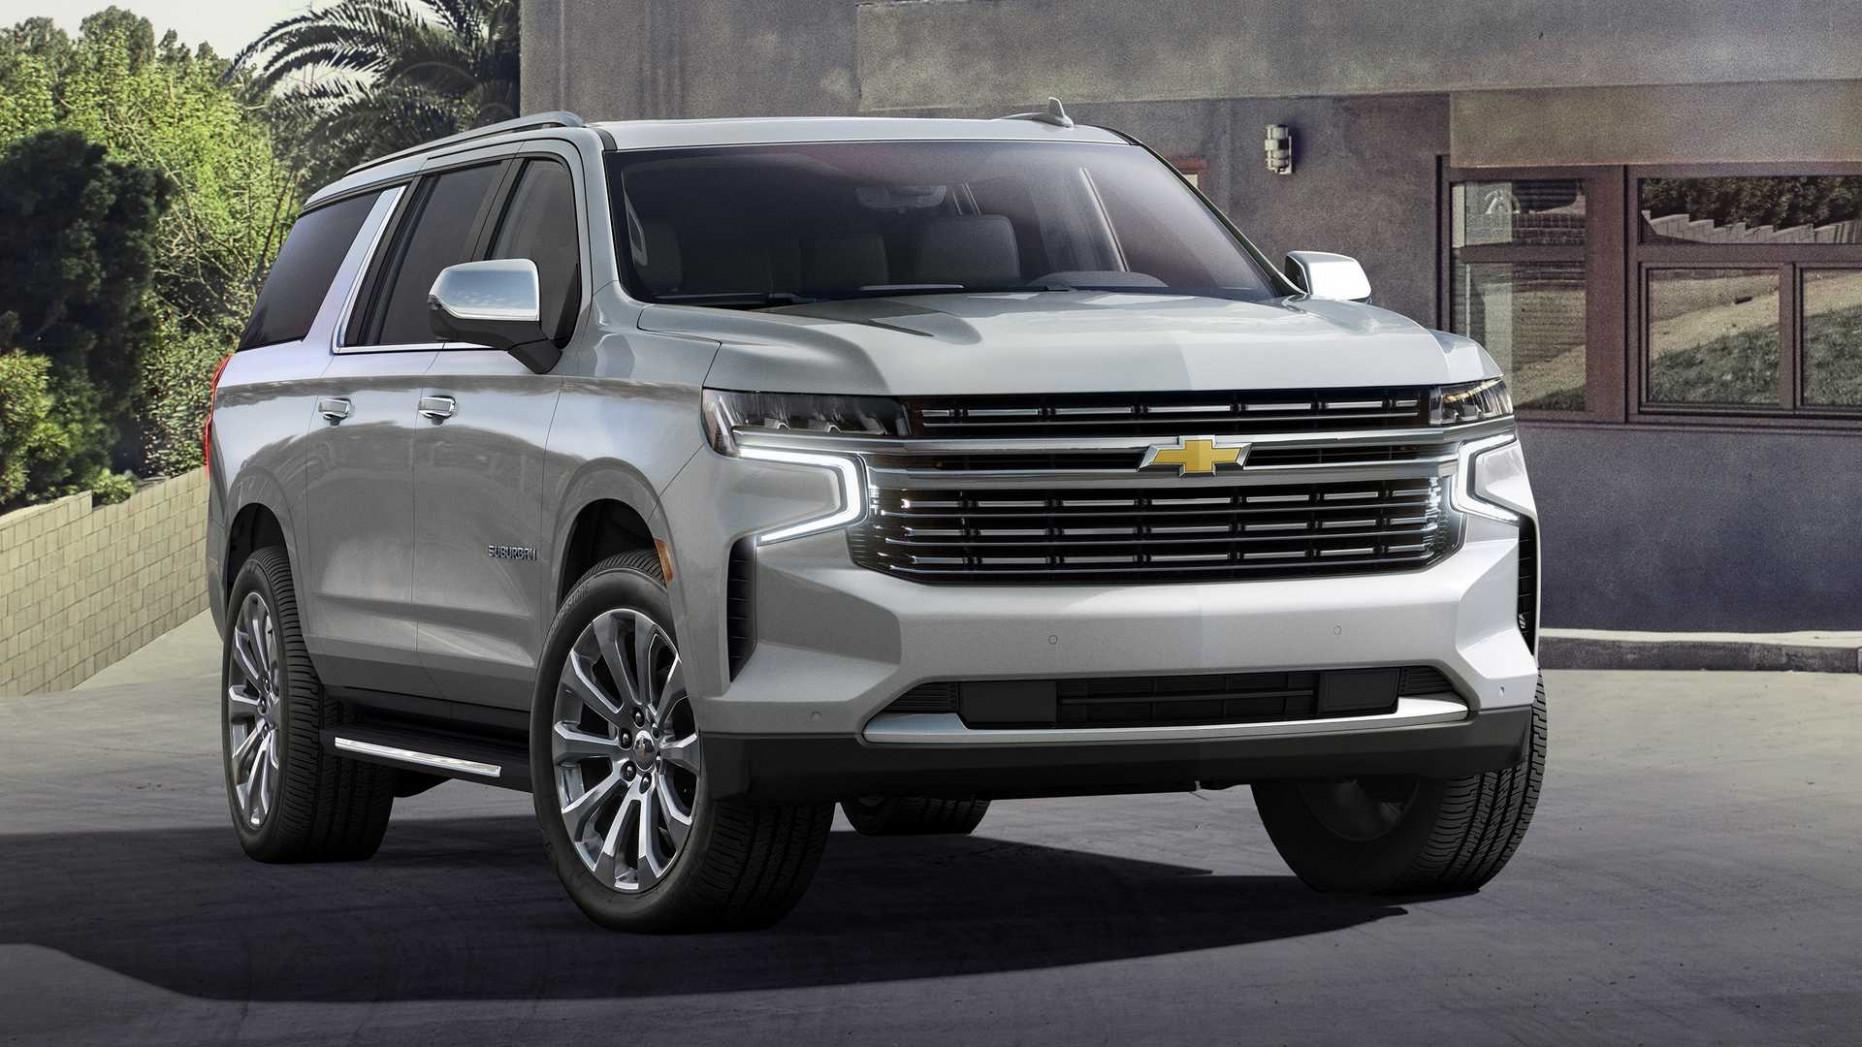 Redesign New Chevrolet Tahoe 2022